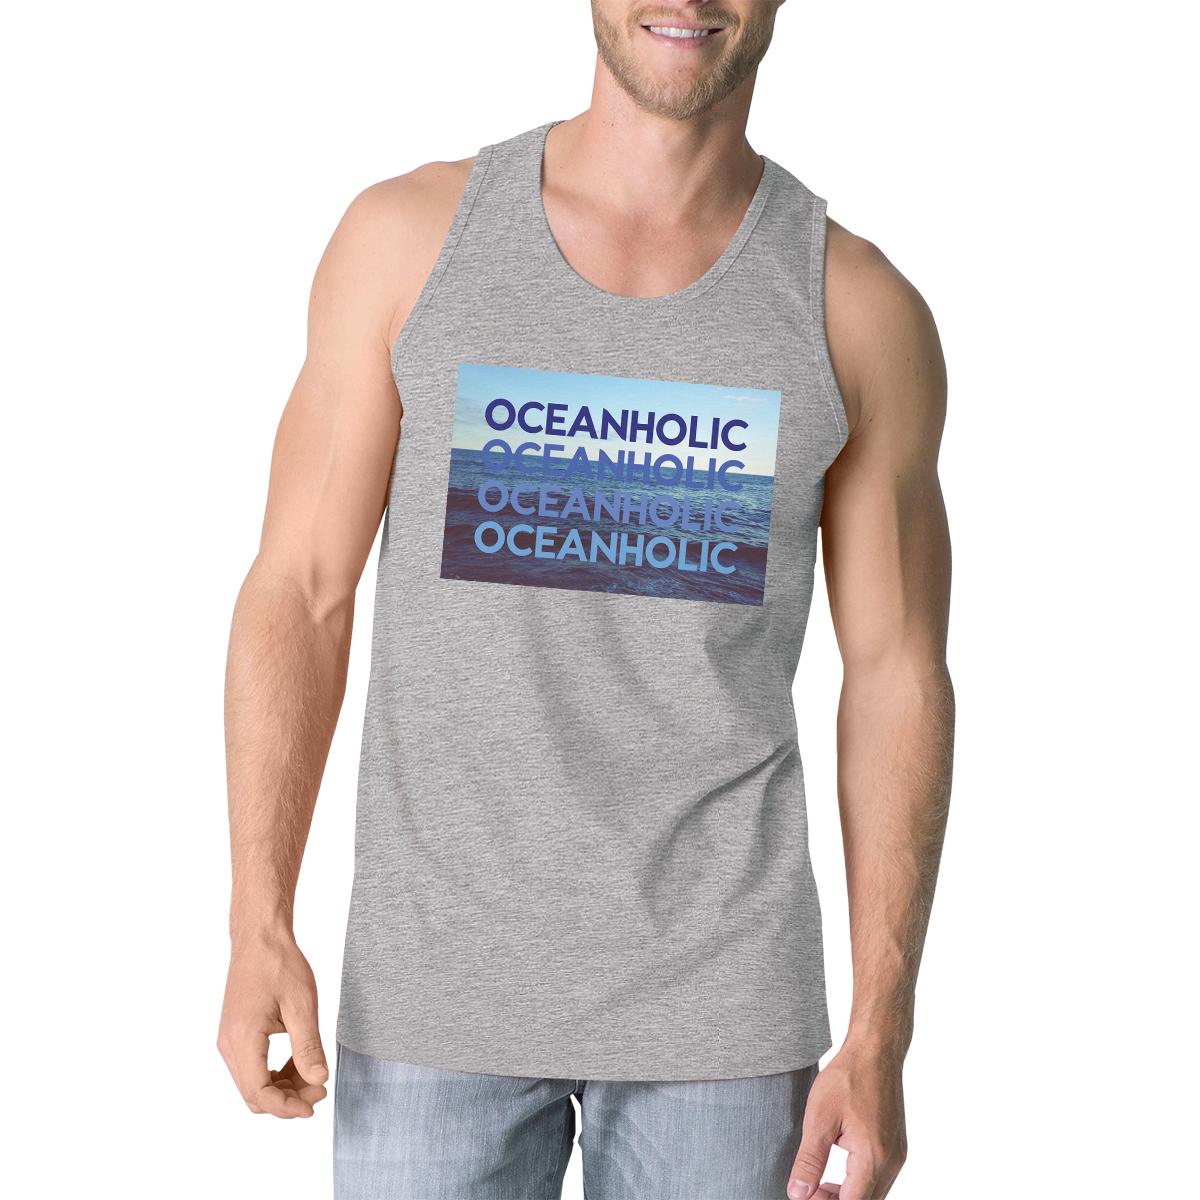 Oceanholic Mens Gray Graphic Tanks Lightweight Tropical Tank Top